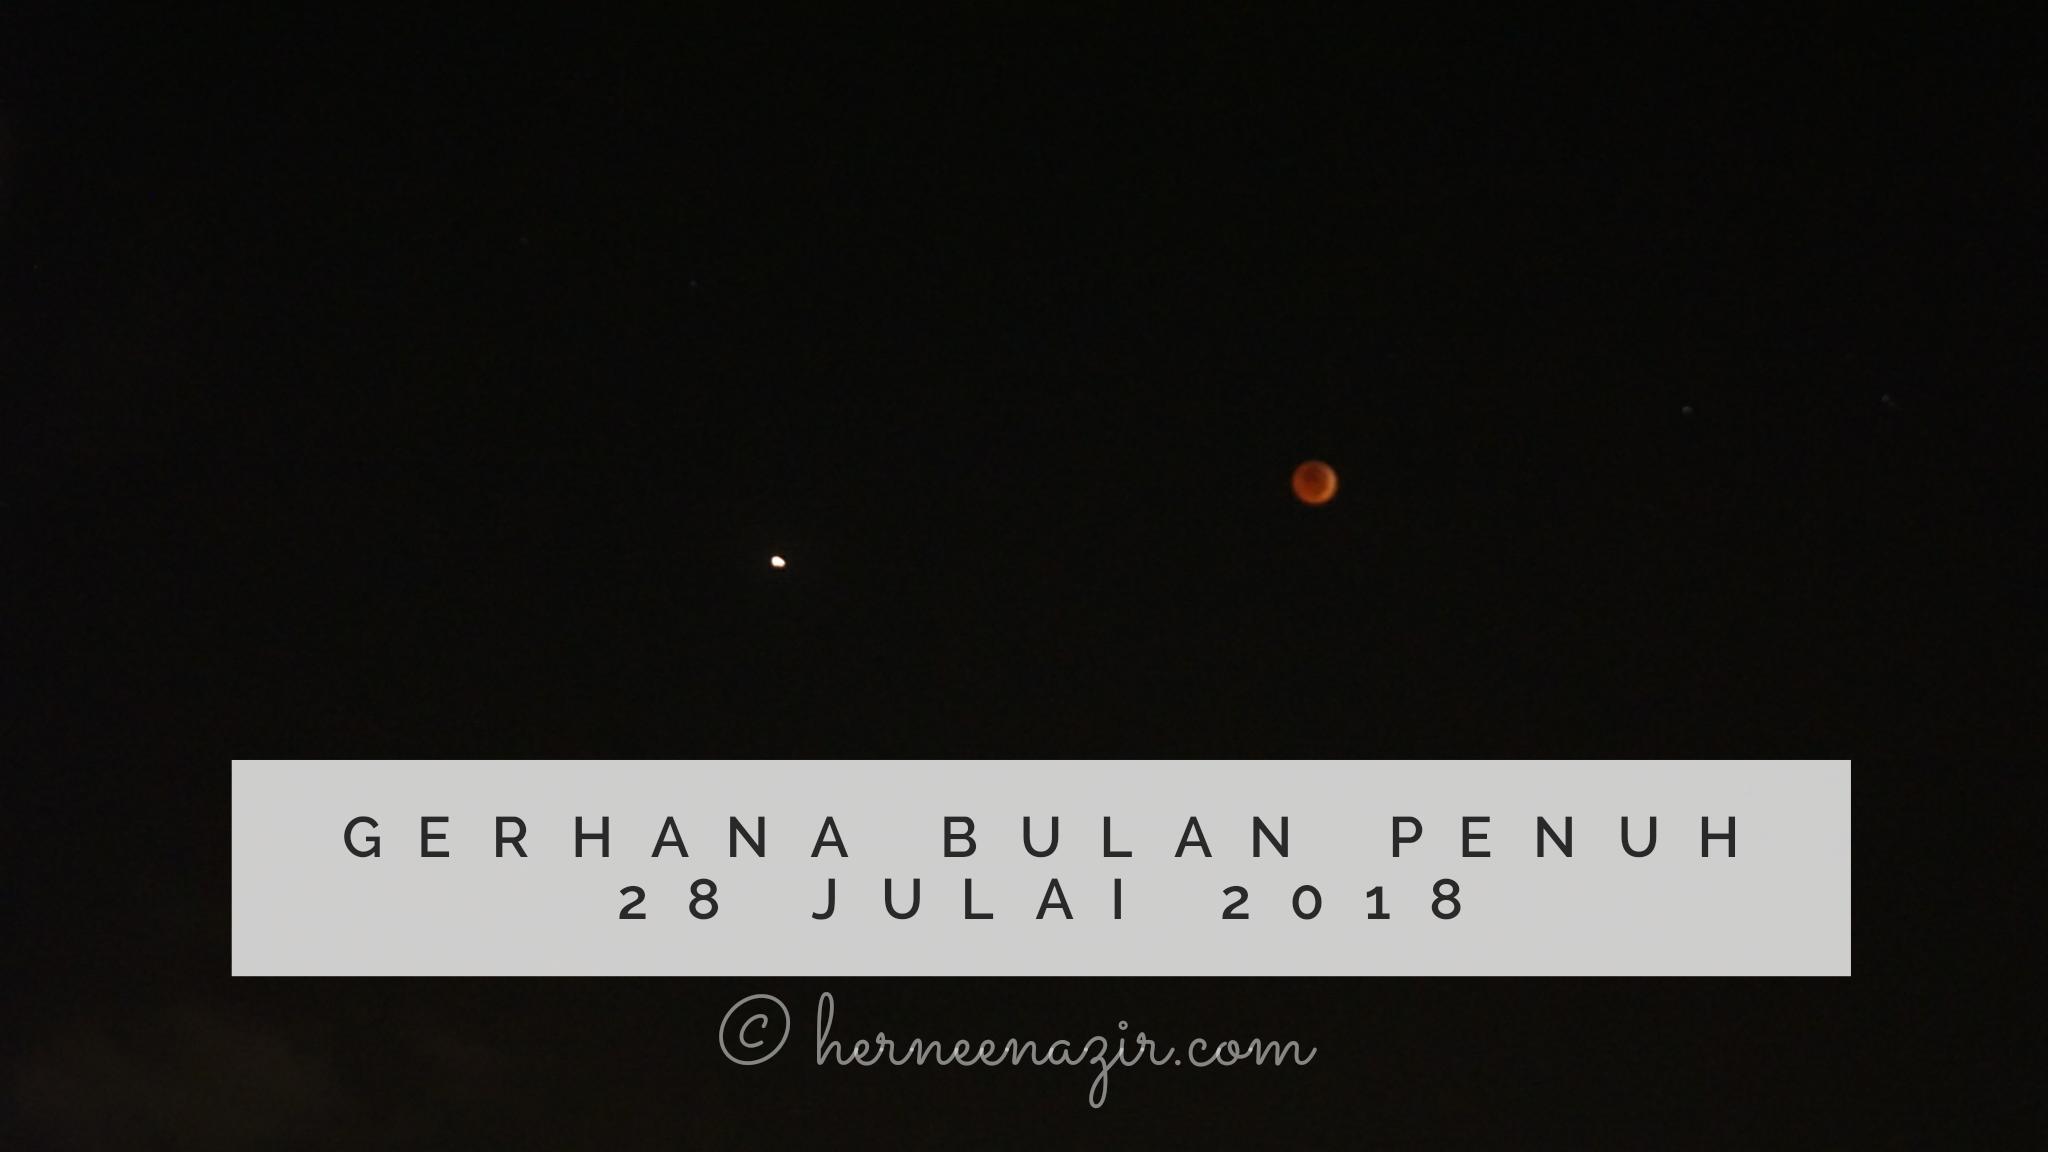 Abang Ilham & Gerhana Bulan Penuh 28 Julai 2018